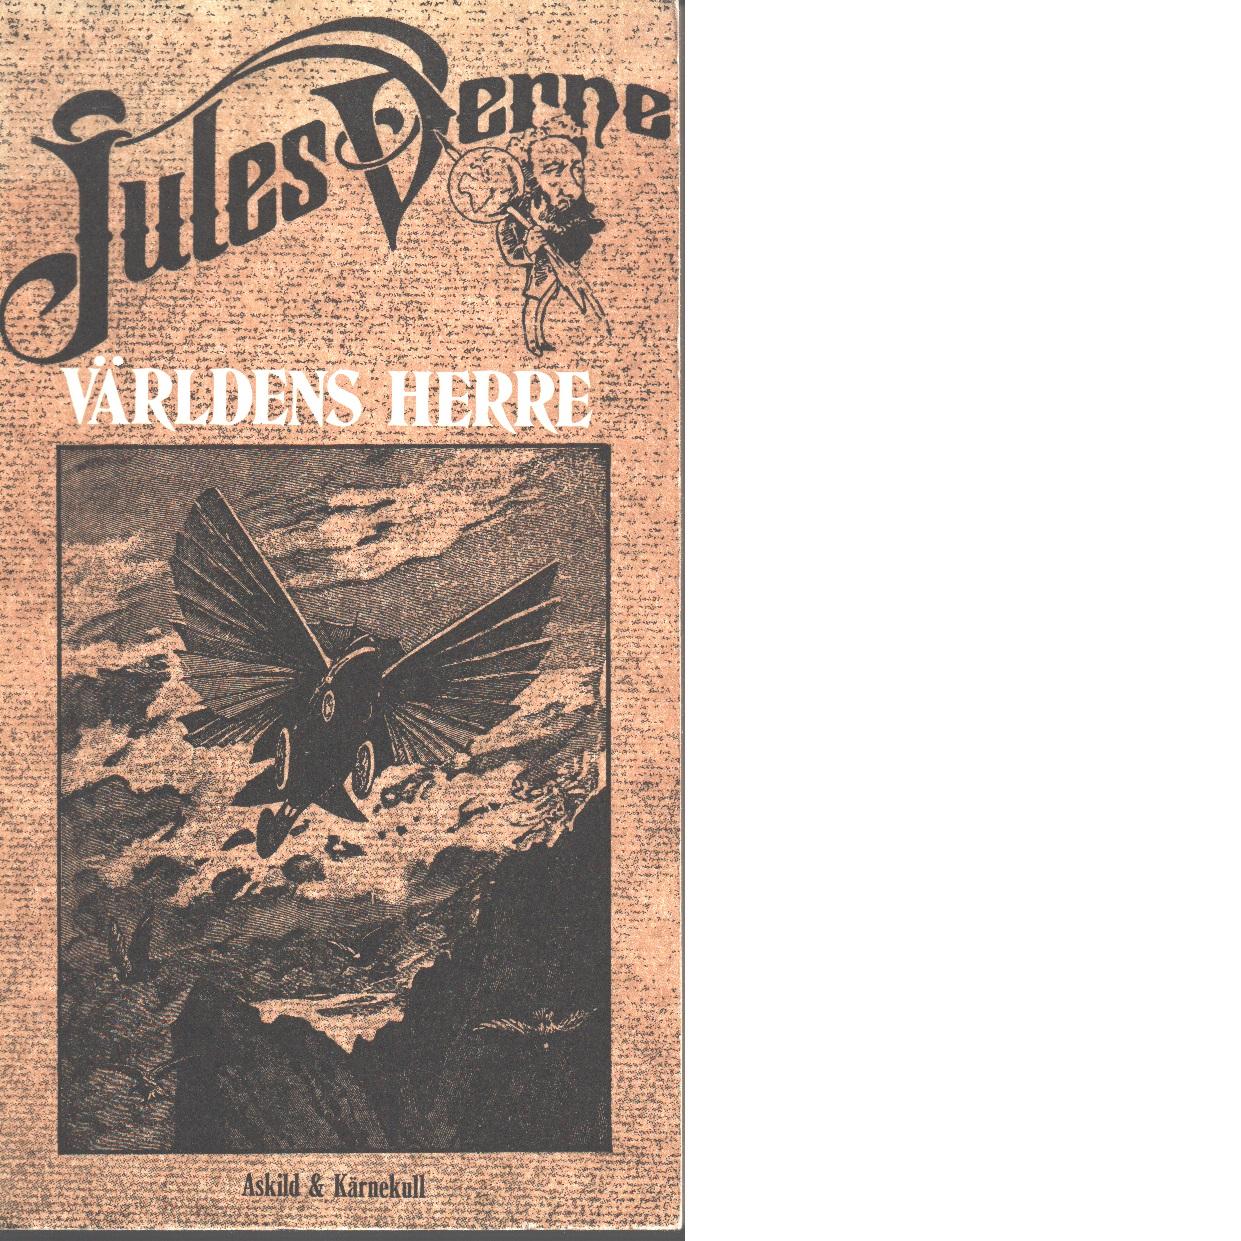 Världens herre - Verne, Jules